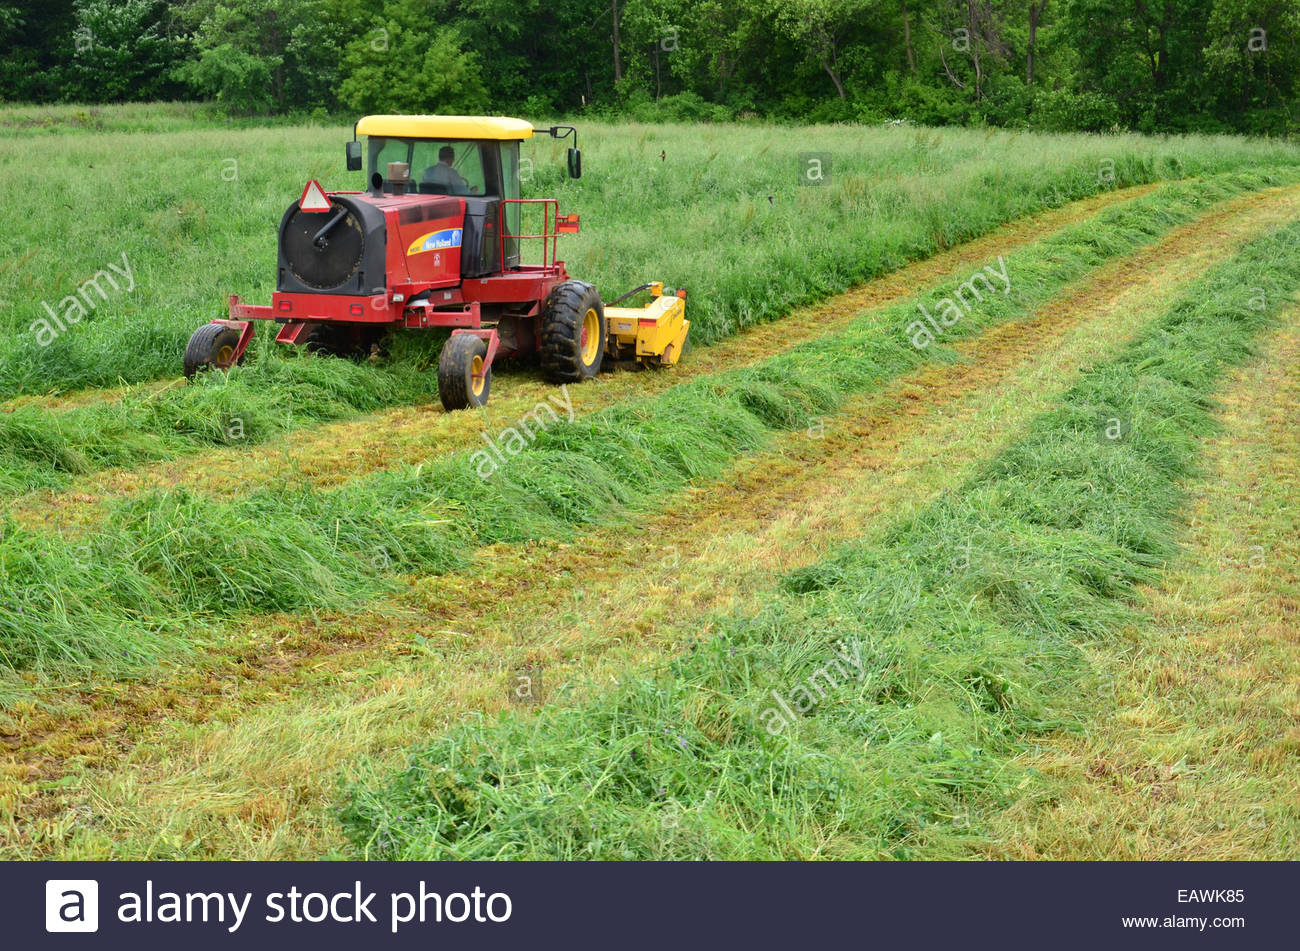 A farmer mows a field of fresh green hay with a discbine mower Stock